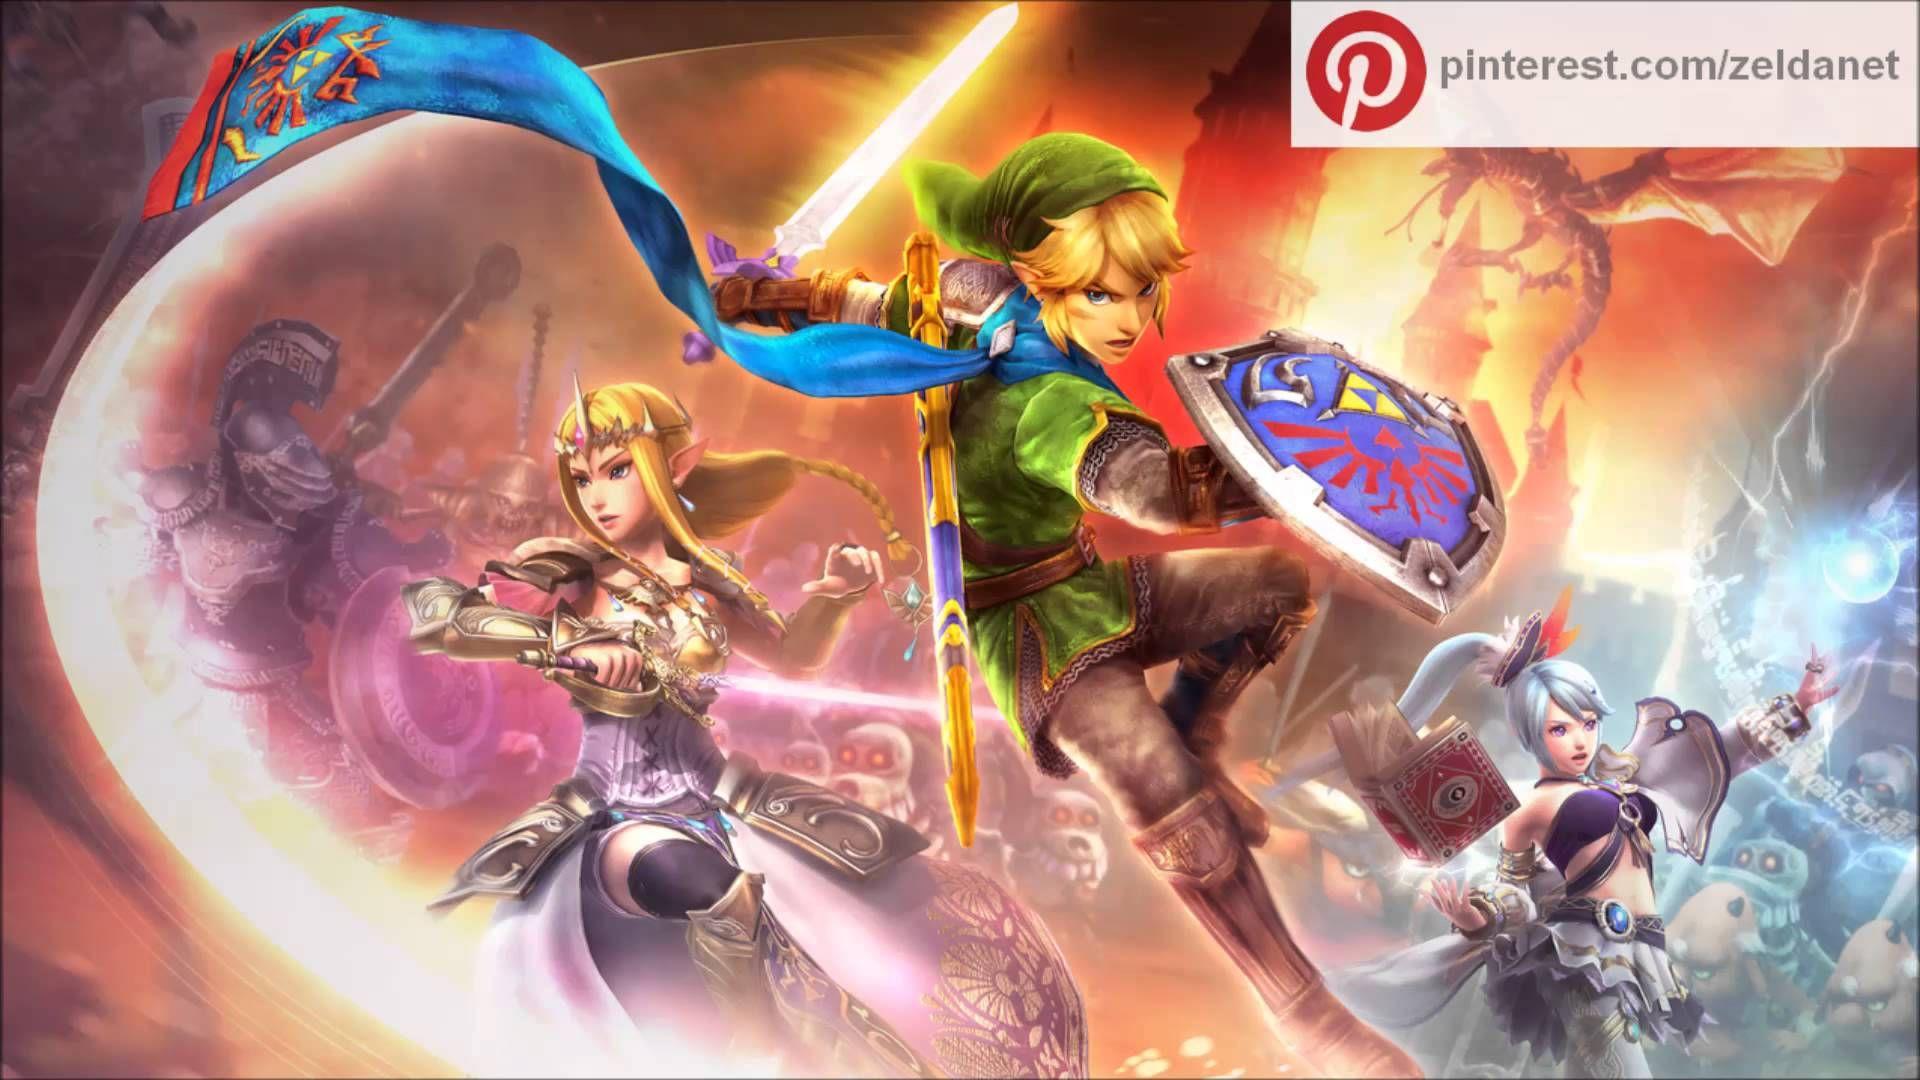 Hyrule Warriors Boss Battle Ocarina Of Time Ost Music Rip Hyrulewarriors Wiiu Zelda Hyrule Warriors Hyrule Warriors Warriors Wallpaper